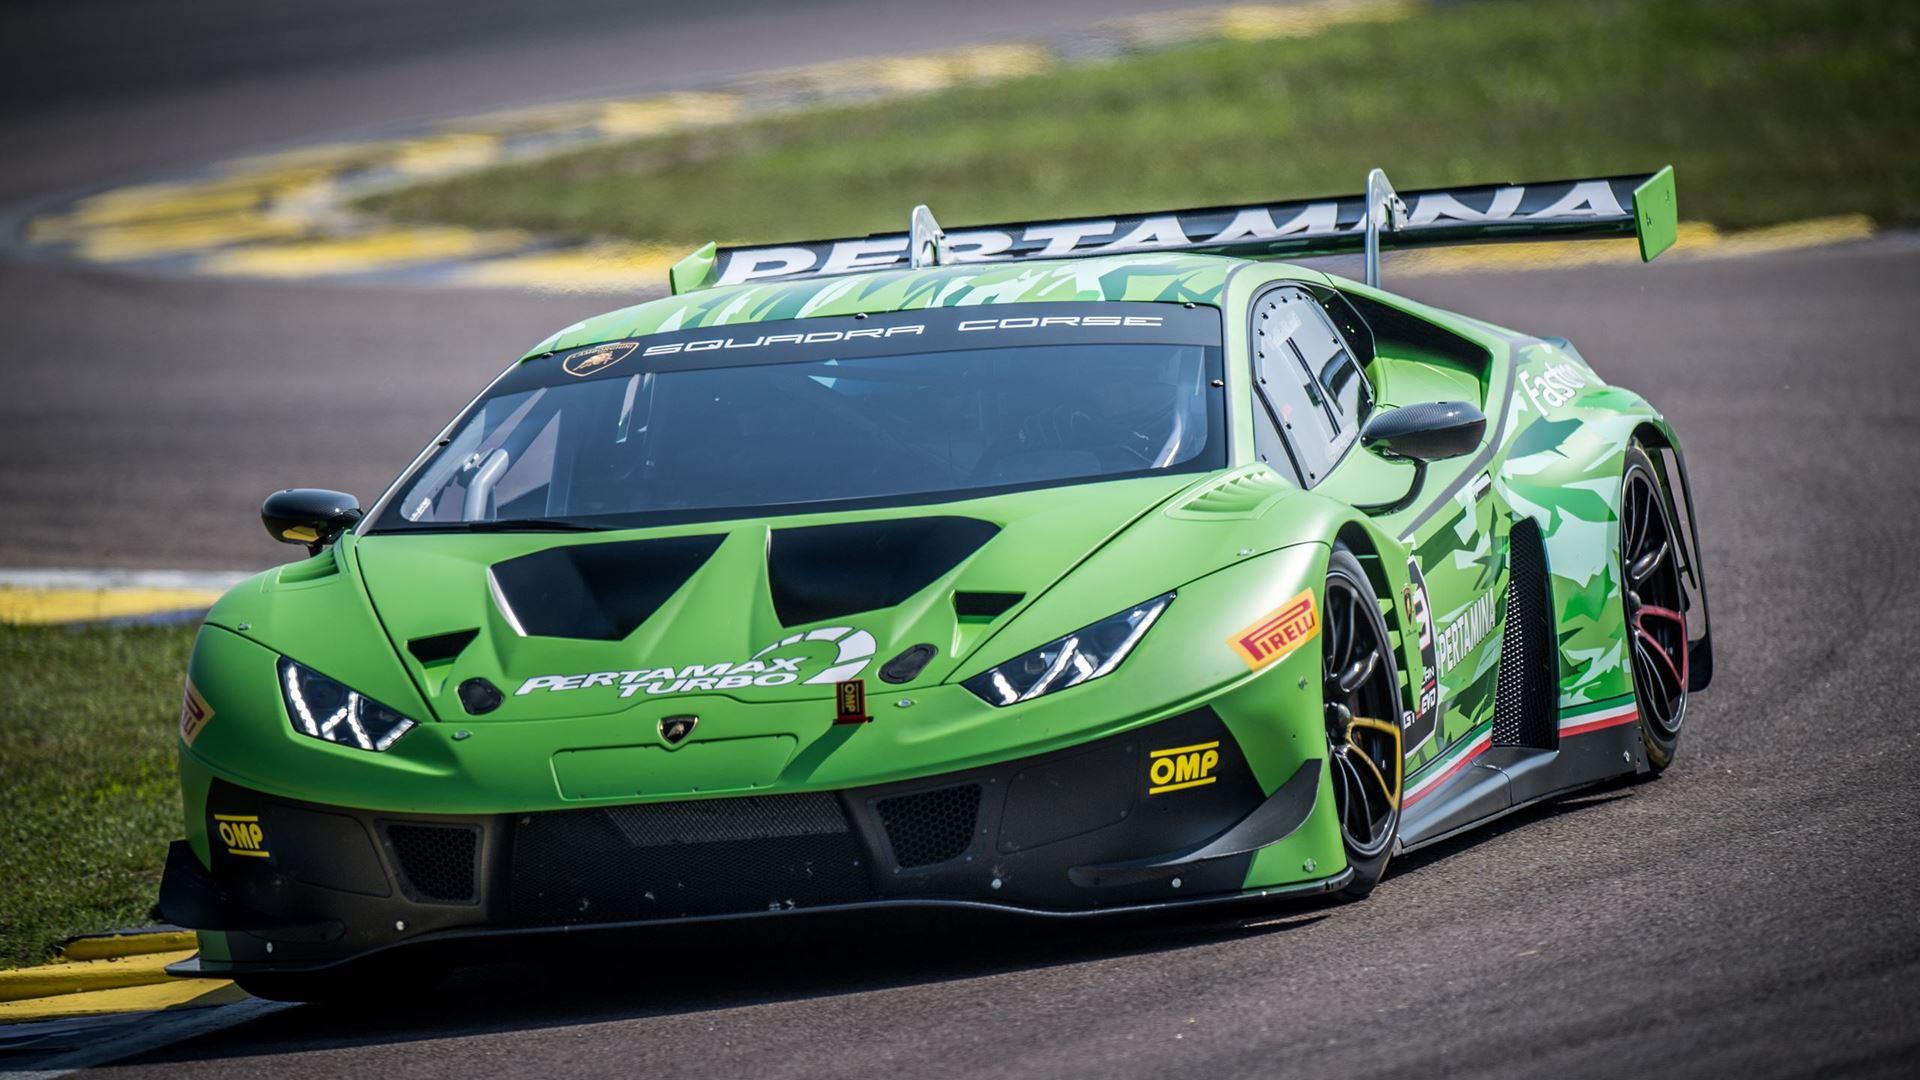 Lamborghini celebrates production of the 400th Huracán racing car - Image 1